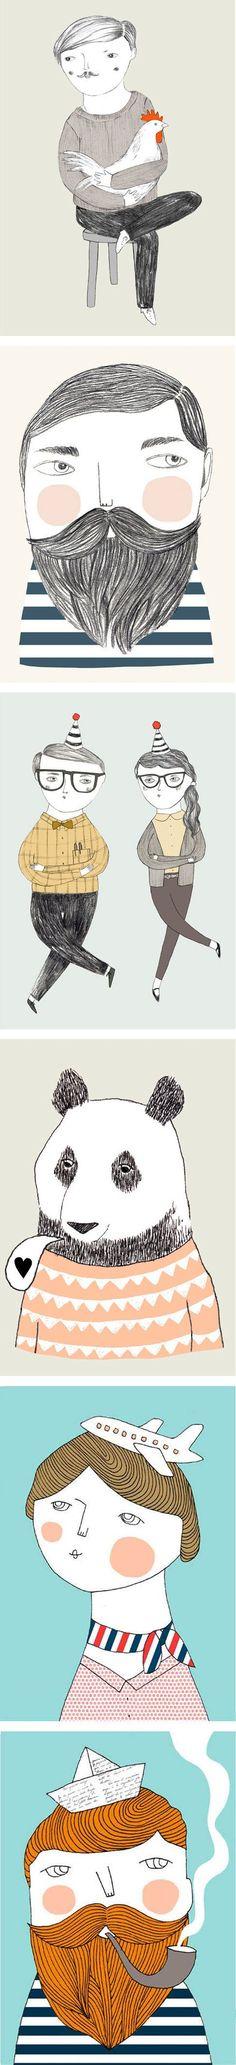 Illustrations by Verónica de Arriba